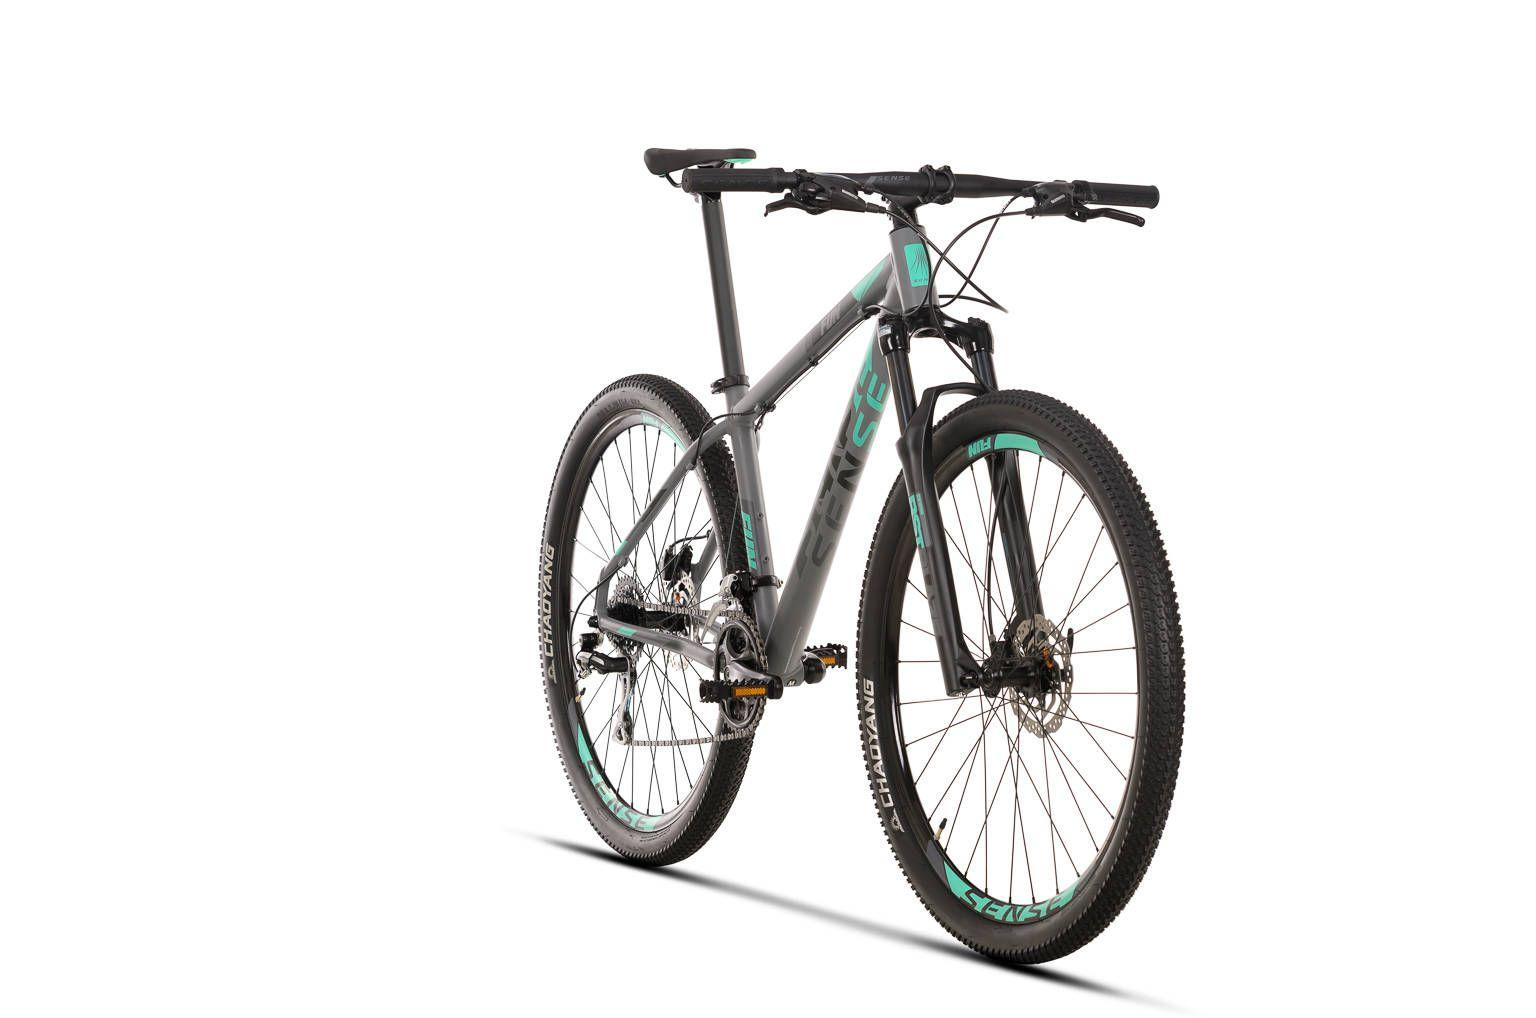 Bicicleta MTB Fun Sense Acqua 2020 - Tamanho L